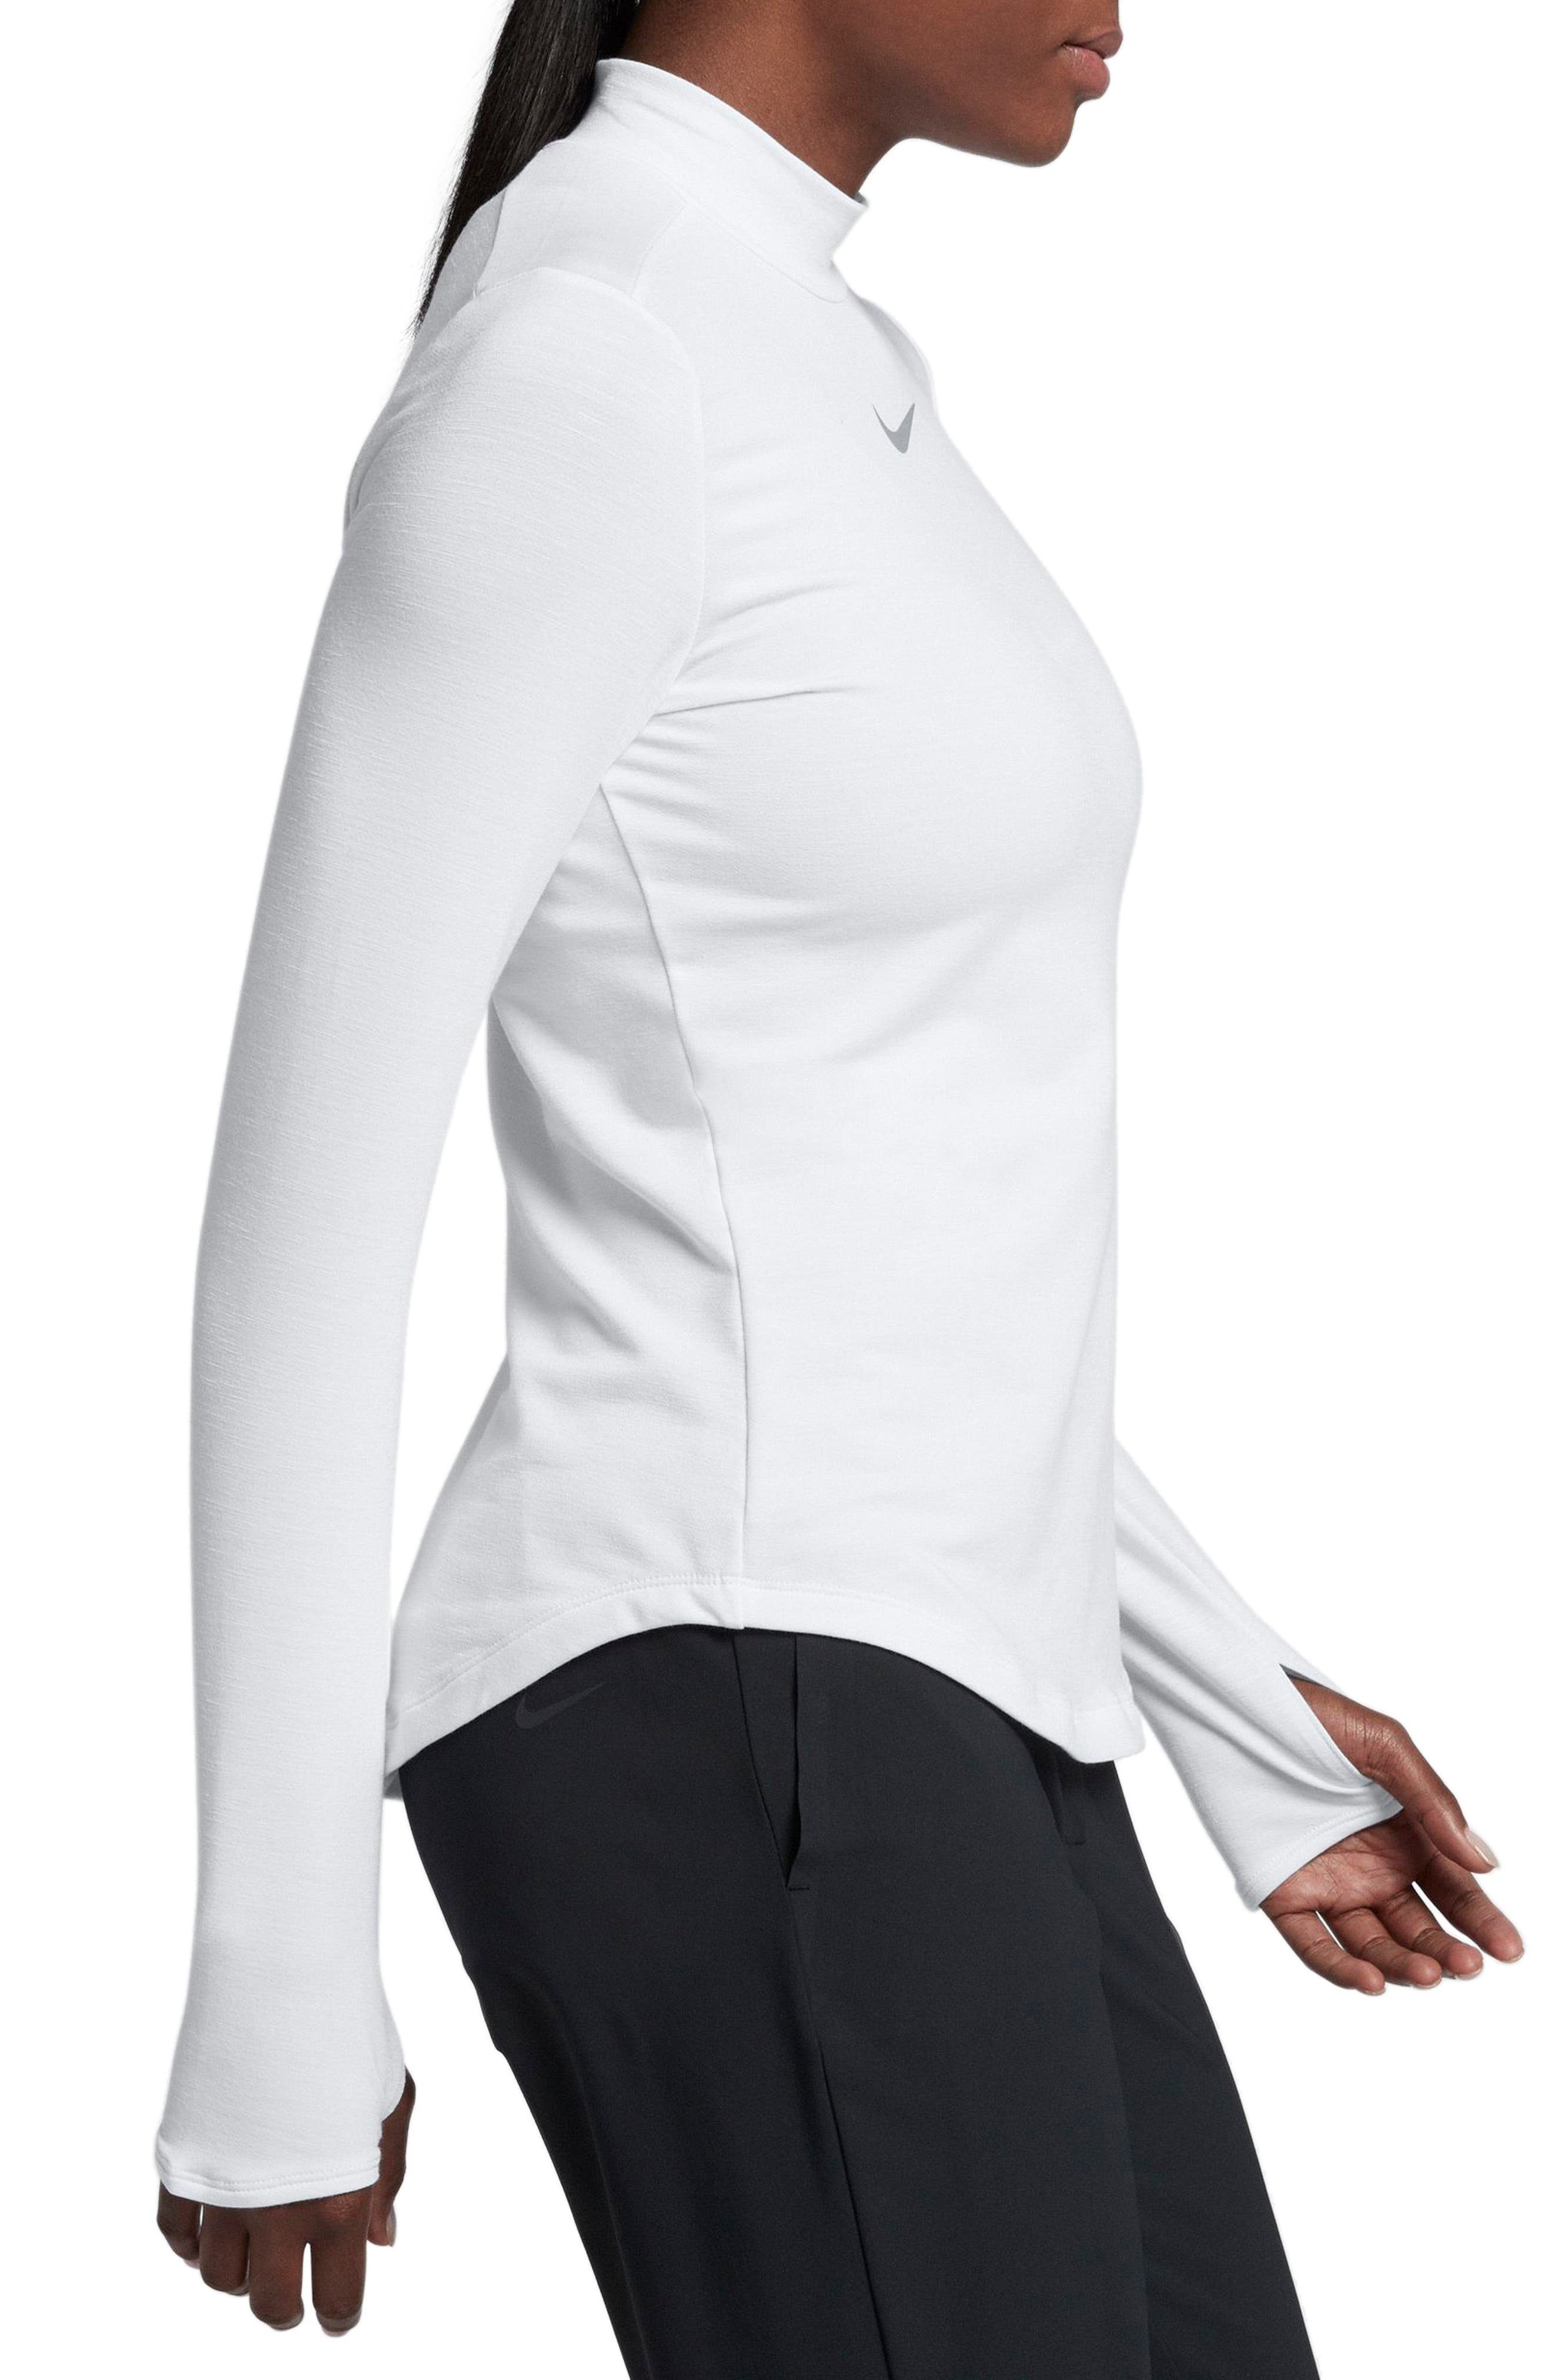 Dry Long Sleeve Golf Top,                             Alternate thumbnail 3, color,                             White